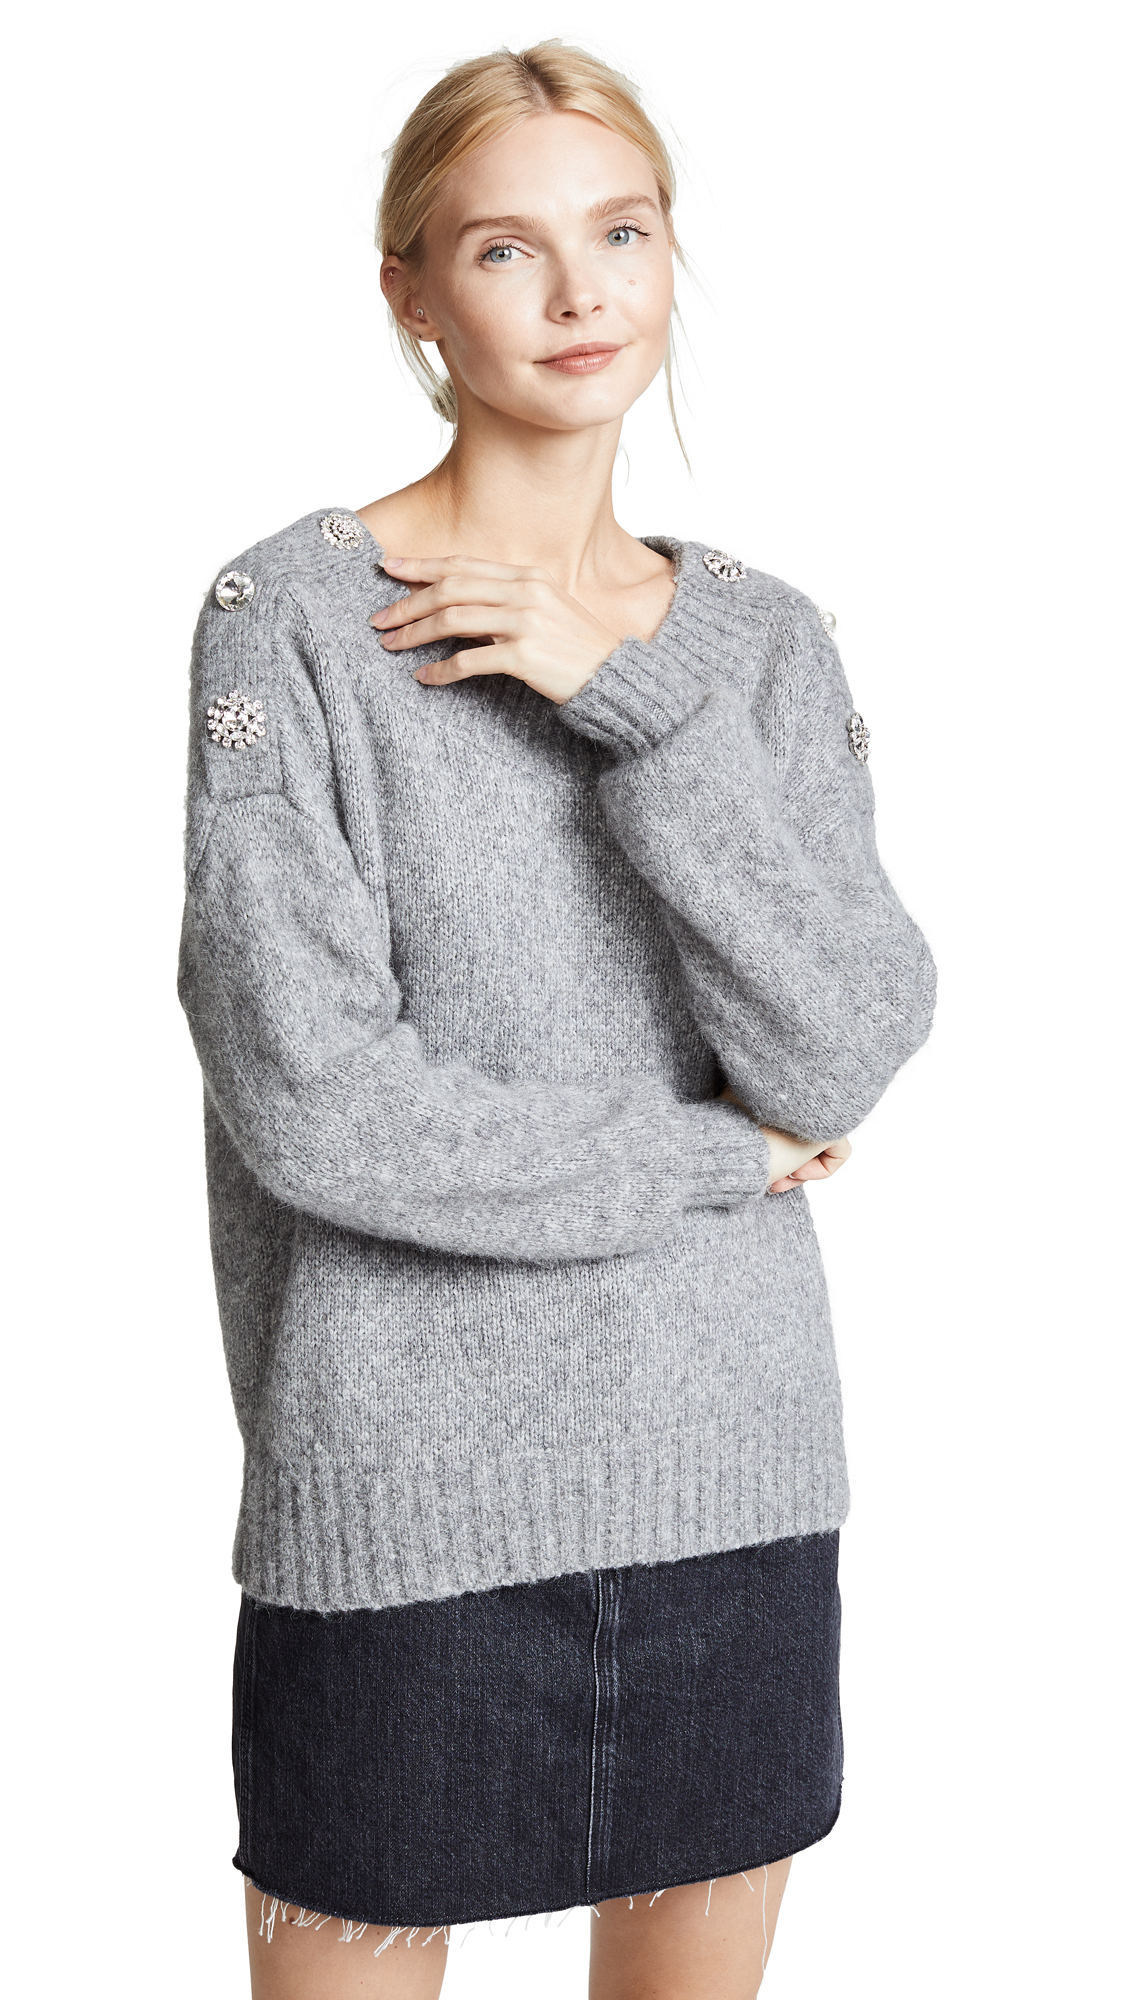 Veronica Beard Chase Sweater In Light Grey Melange